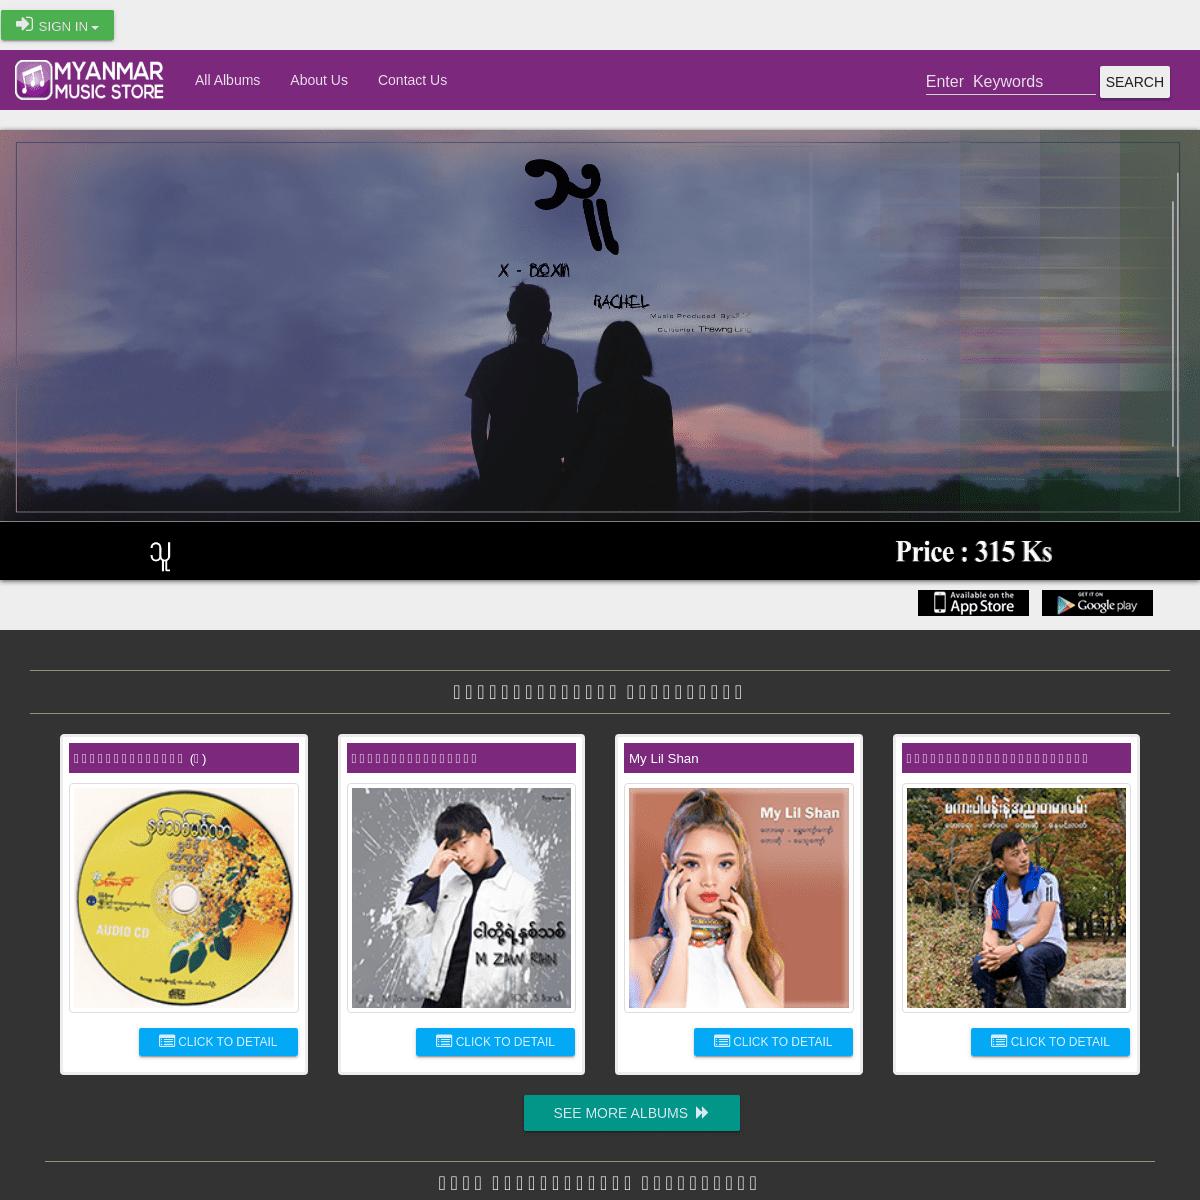 The Smart Way To Buy Myanmar Music - Myanmar Music Store